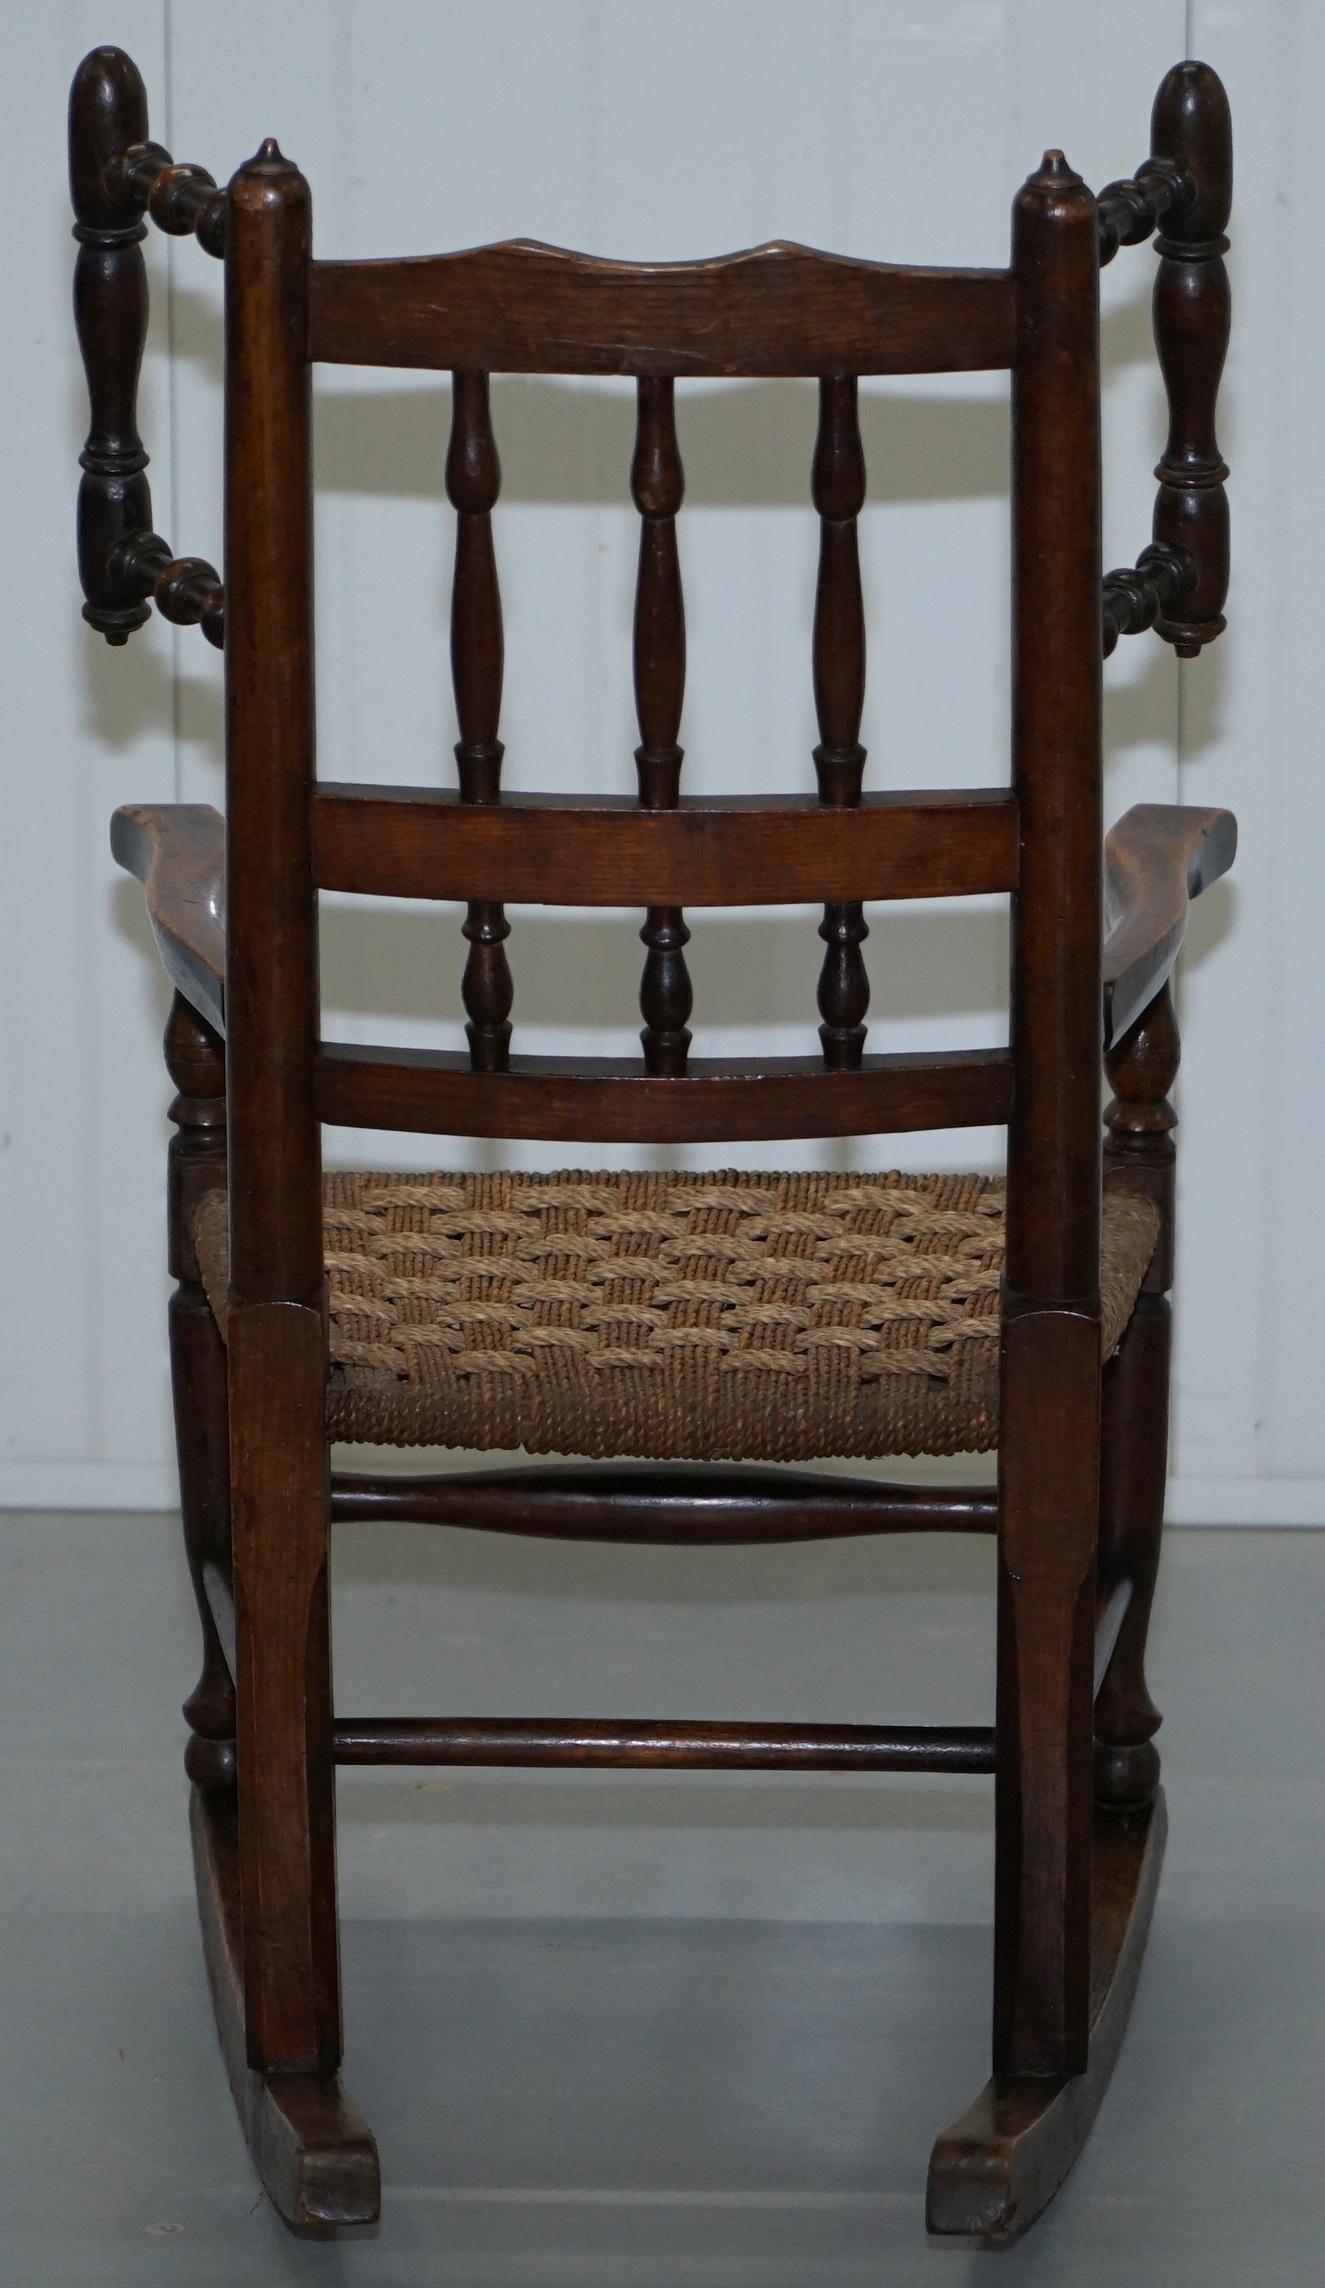 Enjoyable Rare Childrens Small Antique Rope Seat Georgian Rocking Chair Solid Elm Display Machost Co Dining Chair Design Ideas Machostcouk